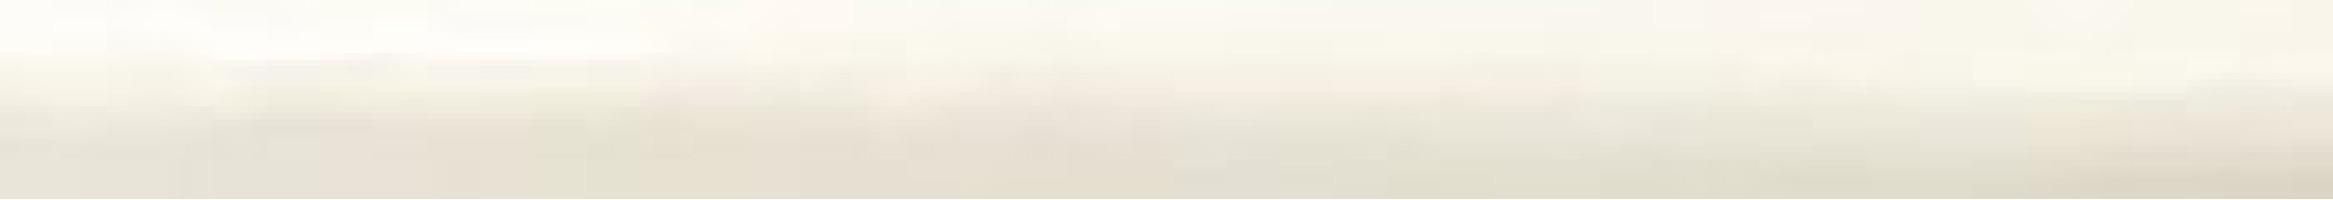 Бордюр Ocean Gloss Ivory 2.5x30 Ribesalbes Ceramica